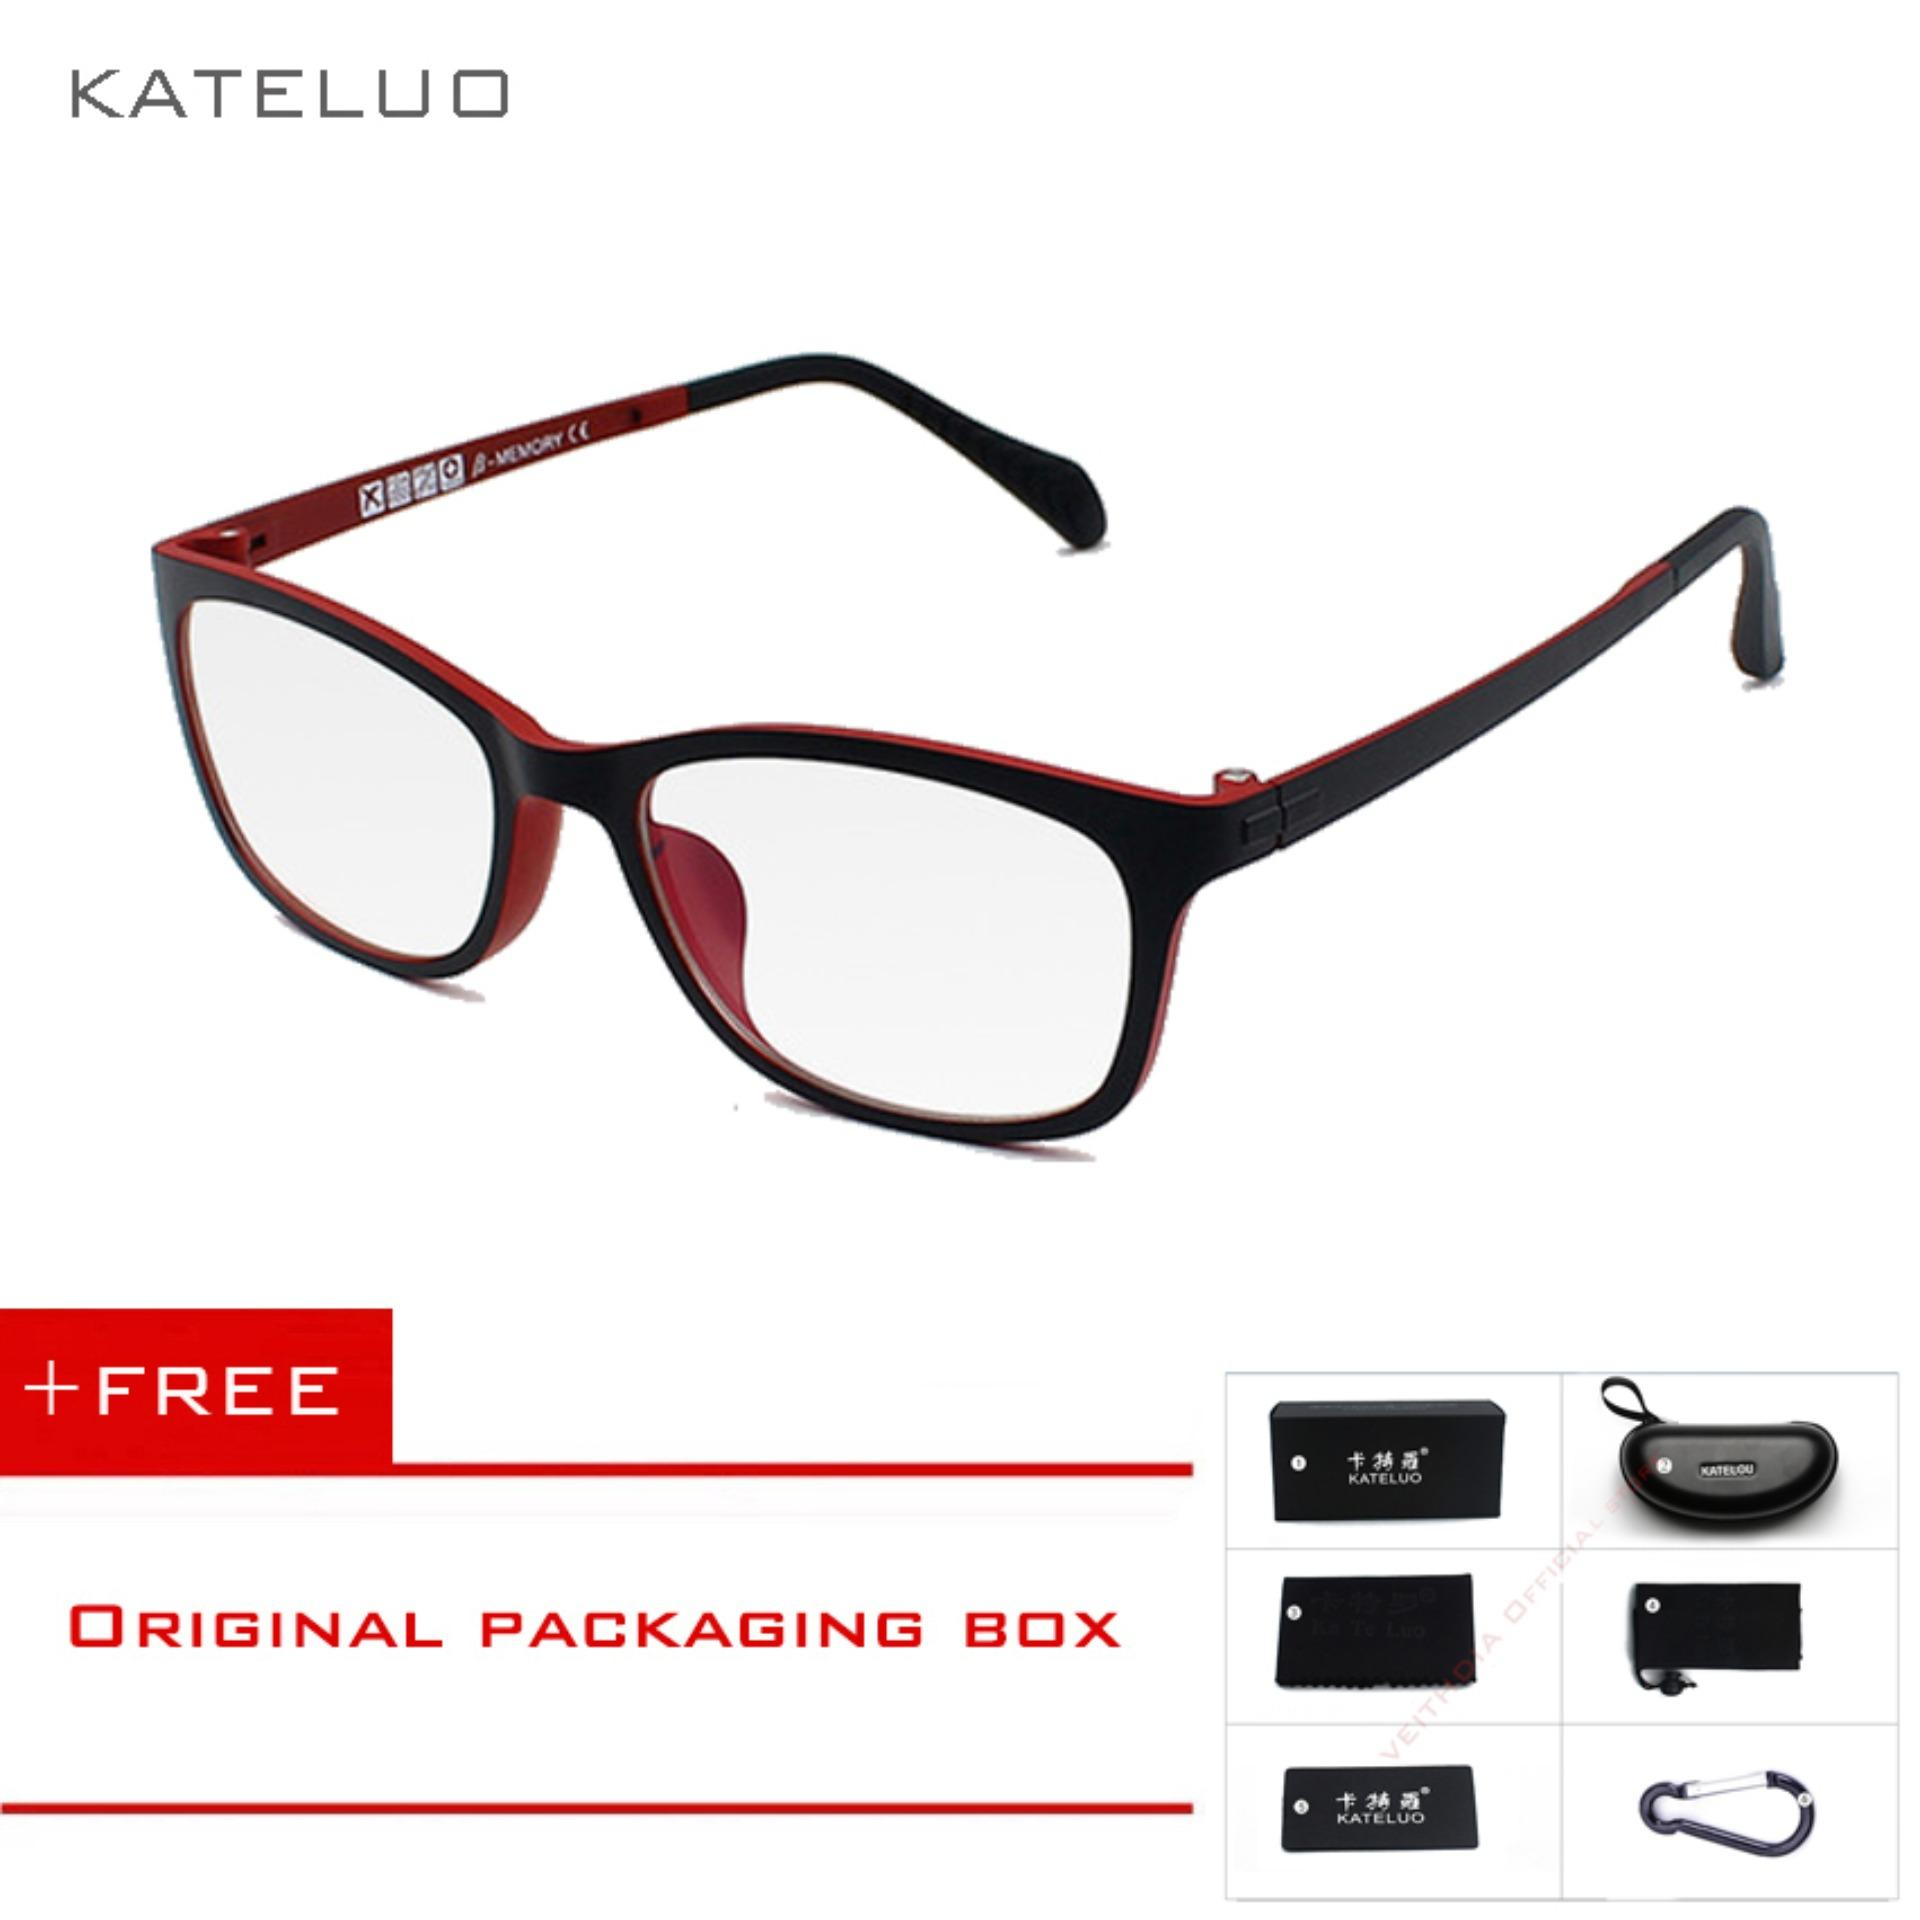 2f5464090 KATELUO Tungsten Kacamata Komputer Anti Laser Kelelahan Radiasi-tahan  Kacamata Bingkai Kacamata Kacamata 13031